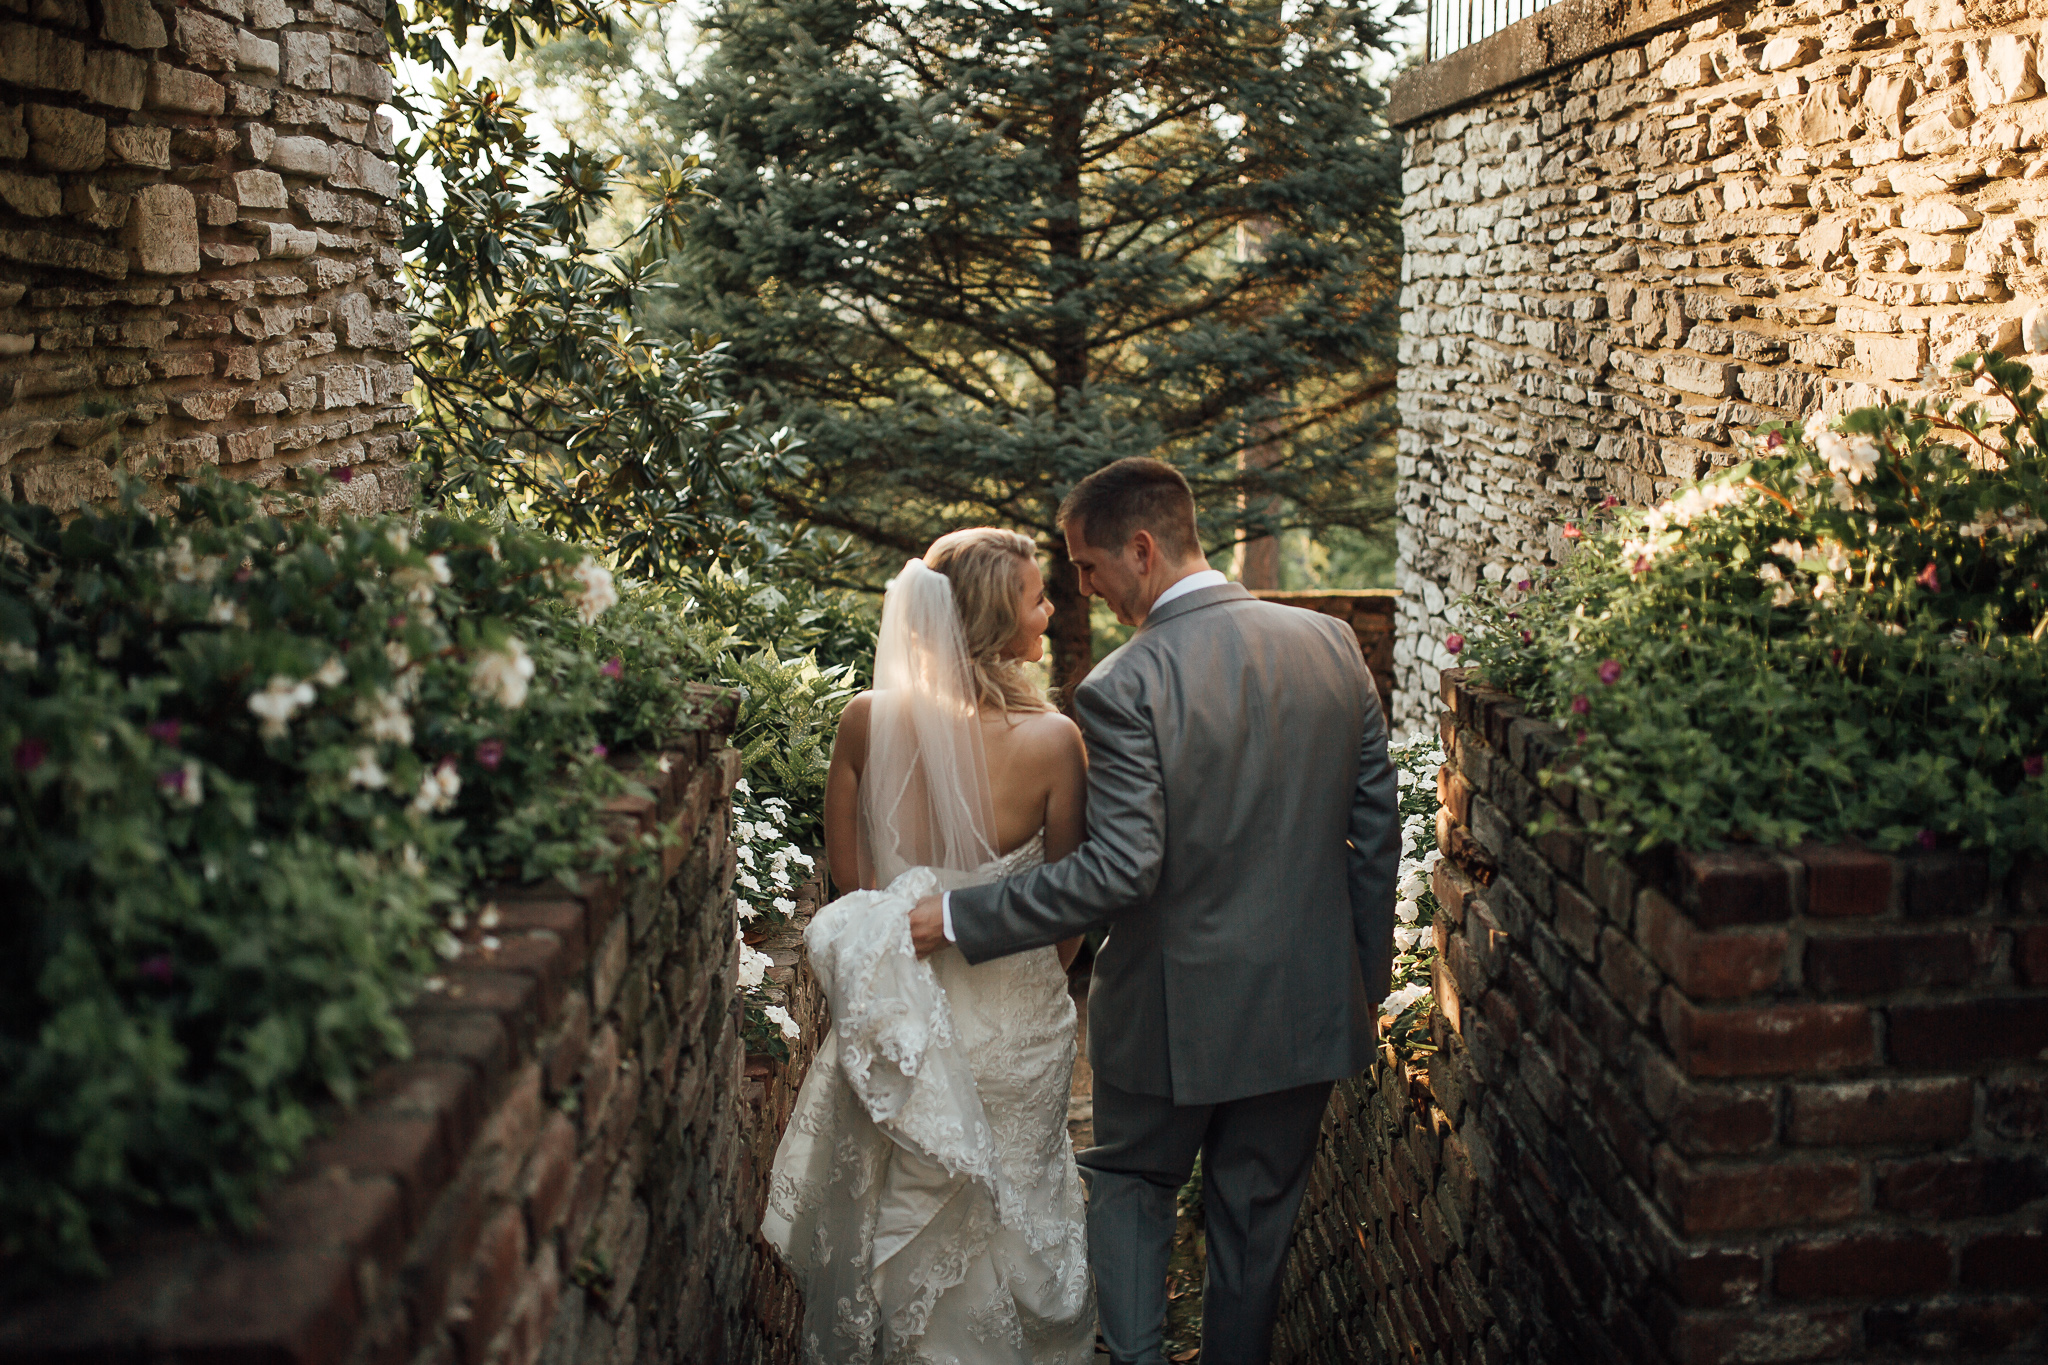 memphis-wedding-photographer-cassie-cook-photography-chattanooga-wedding-photographer-knoxville-botanic-garden-wedding